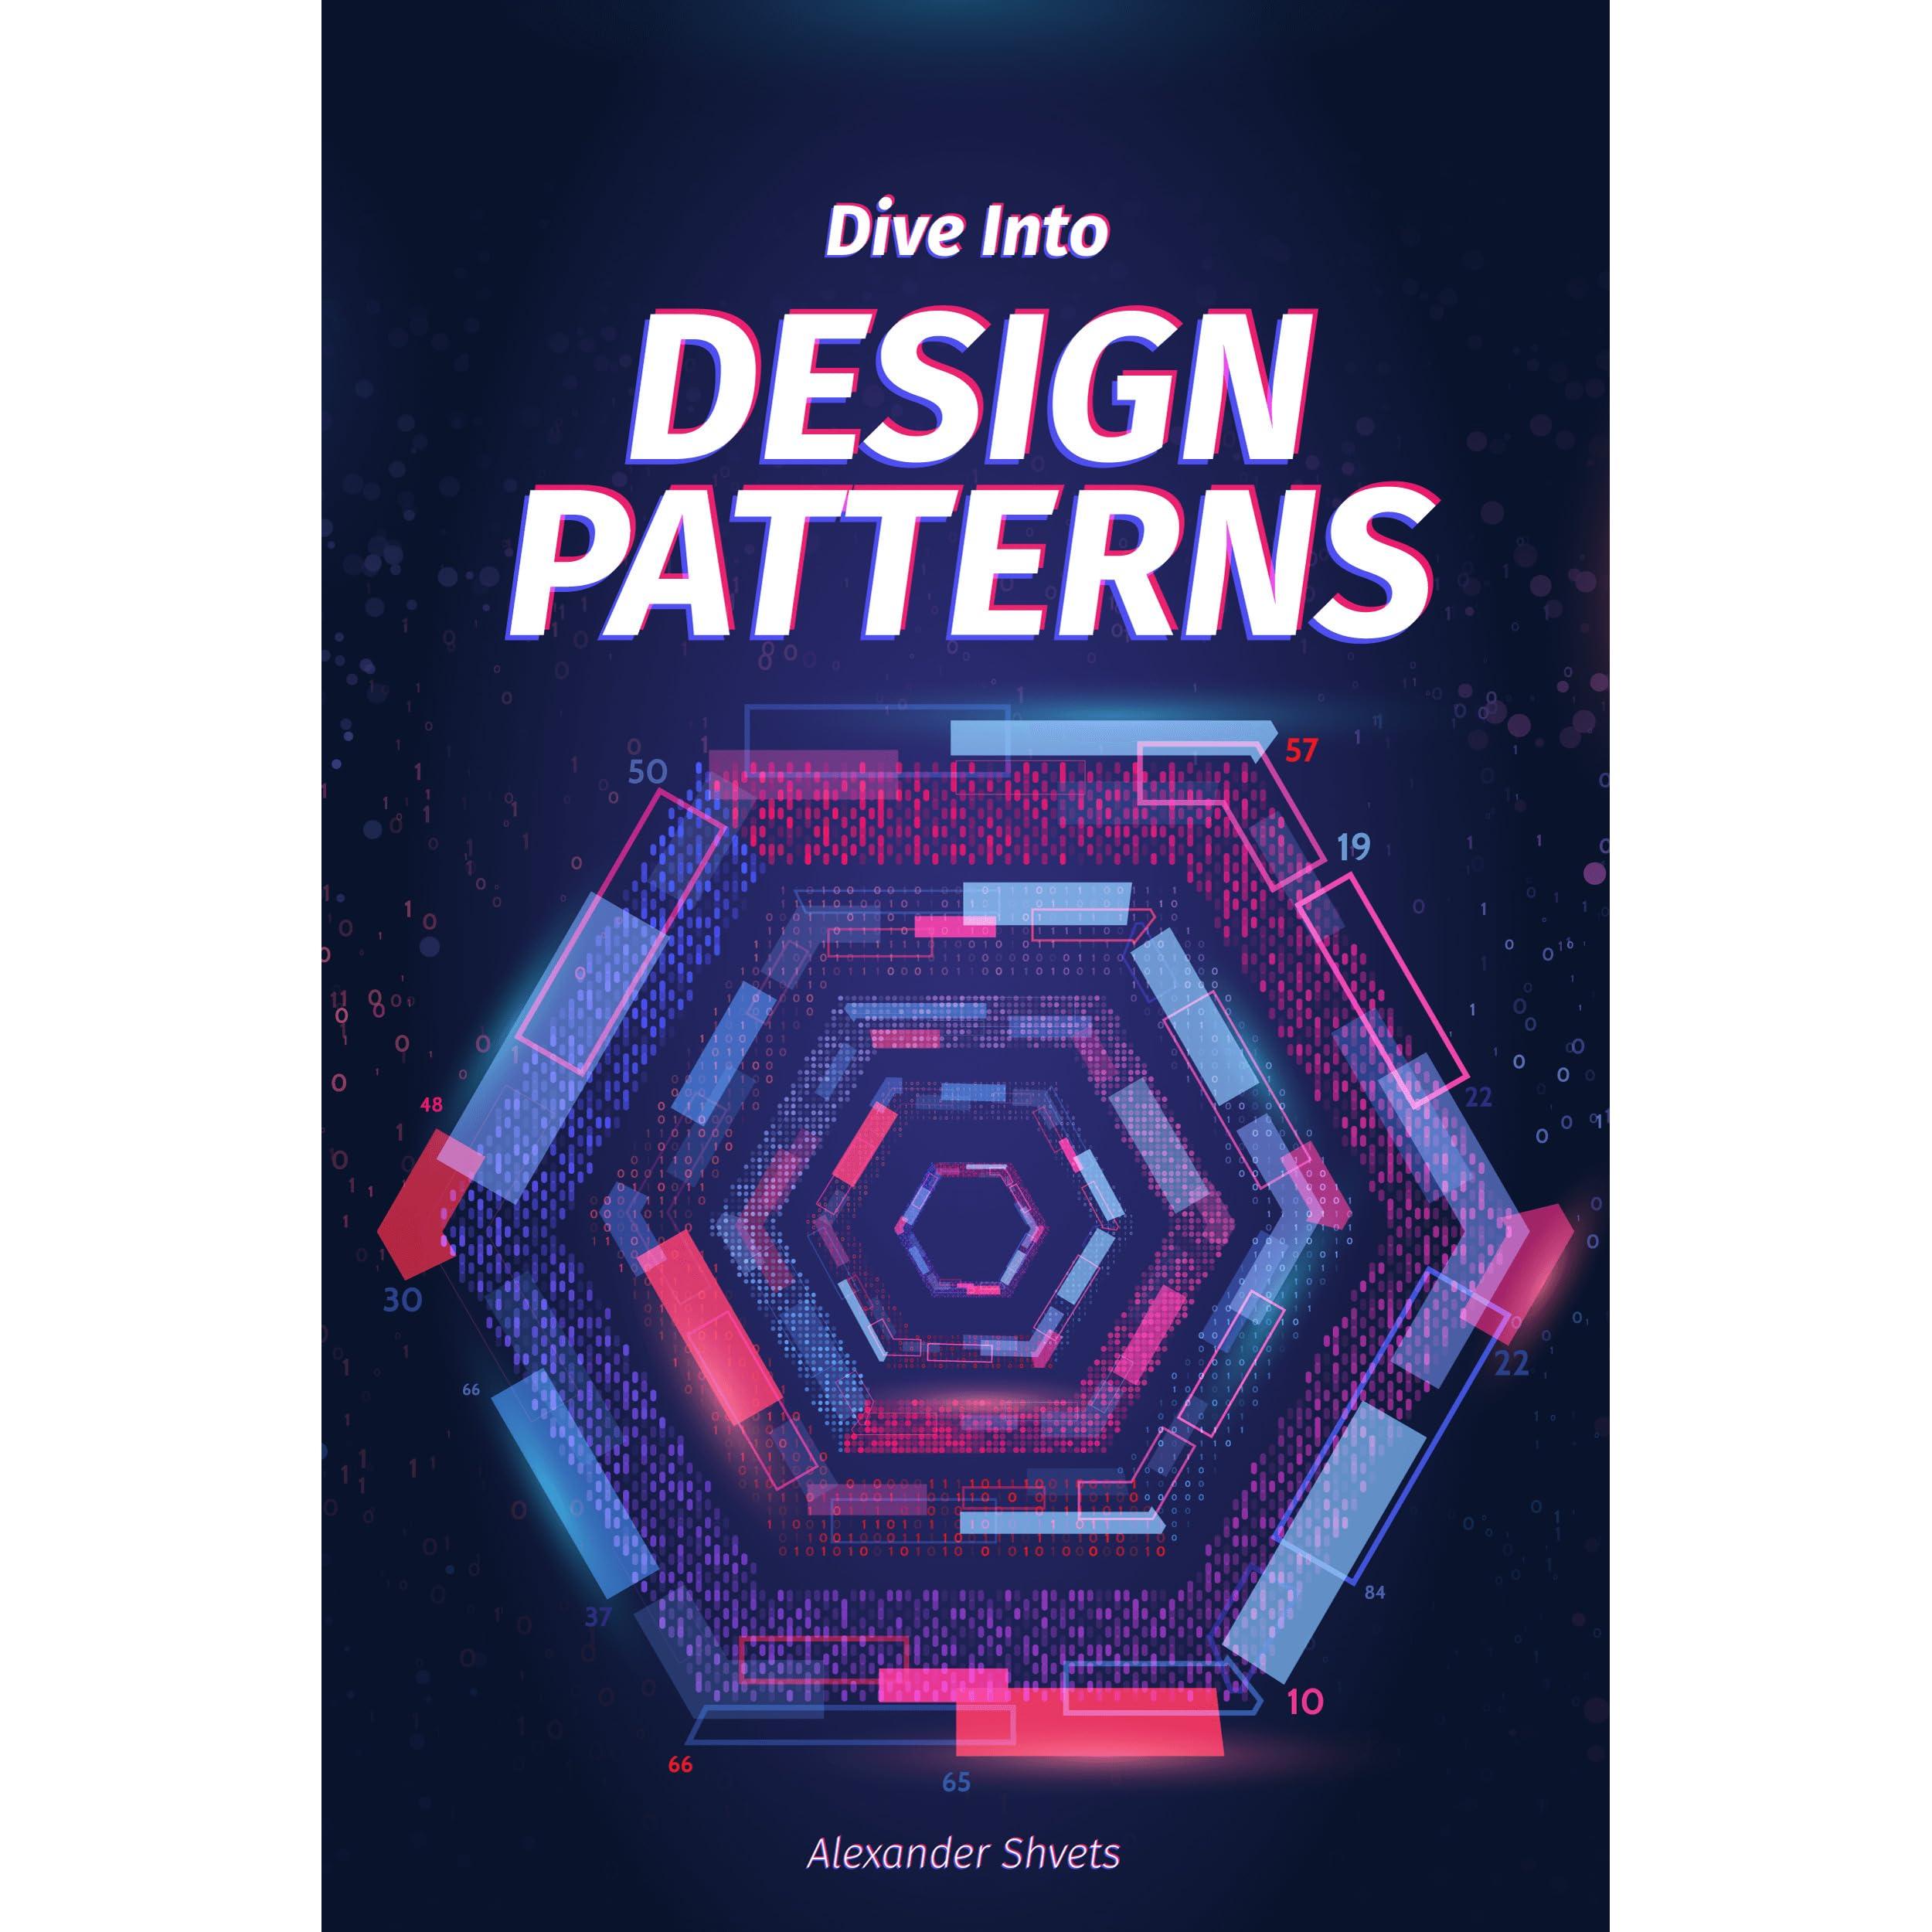 Dive Into Design Patterns by Alexander Shvets